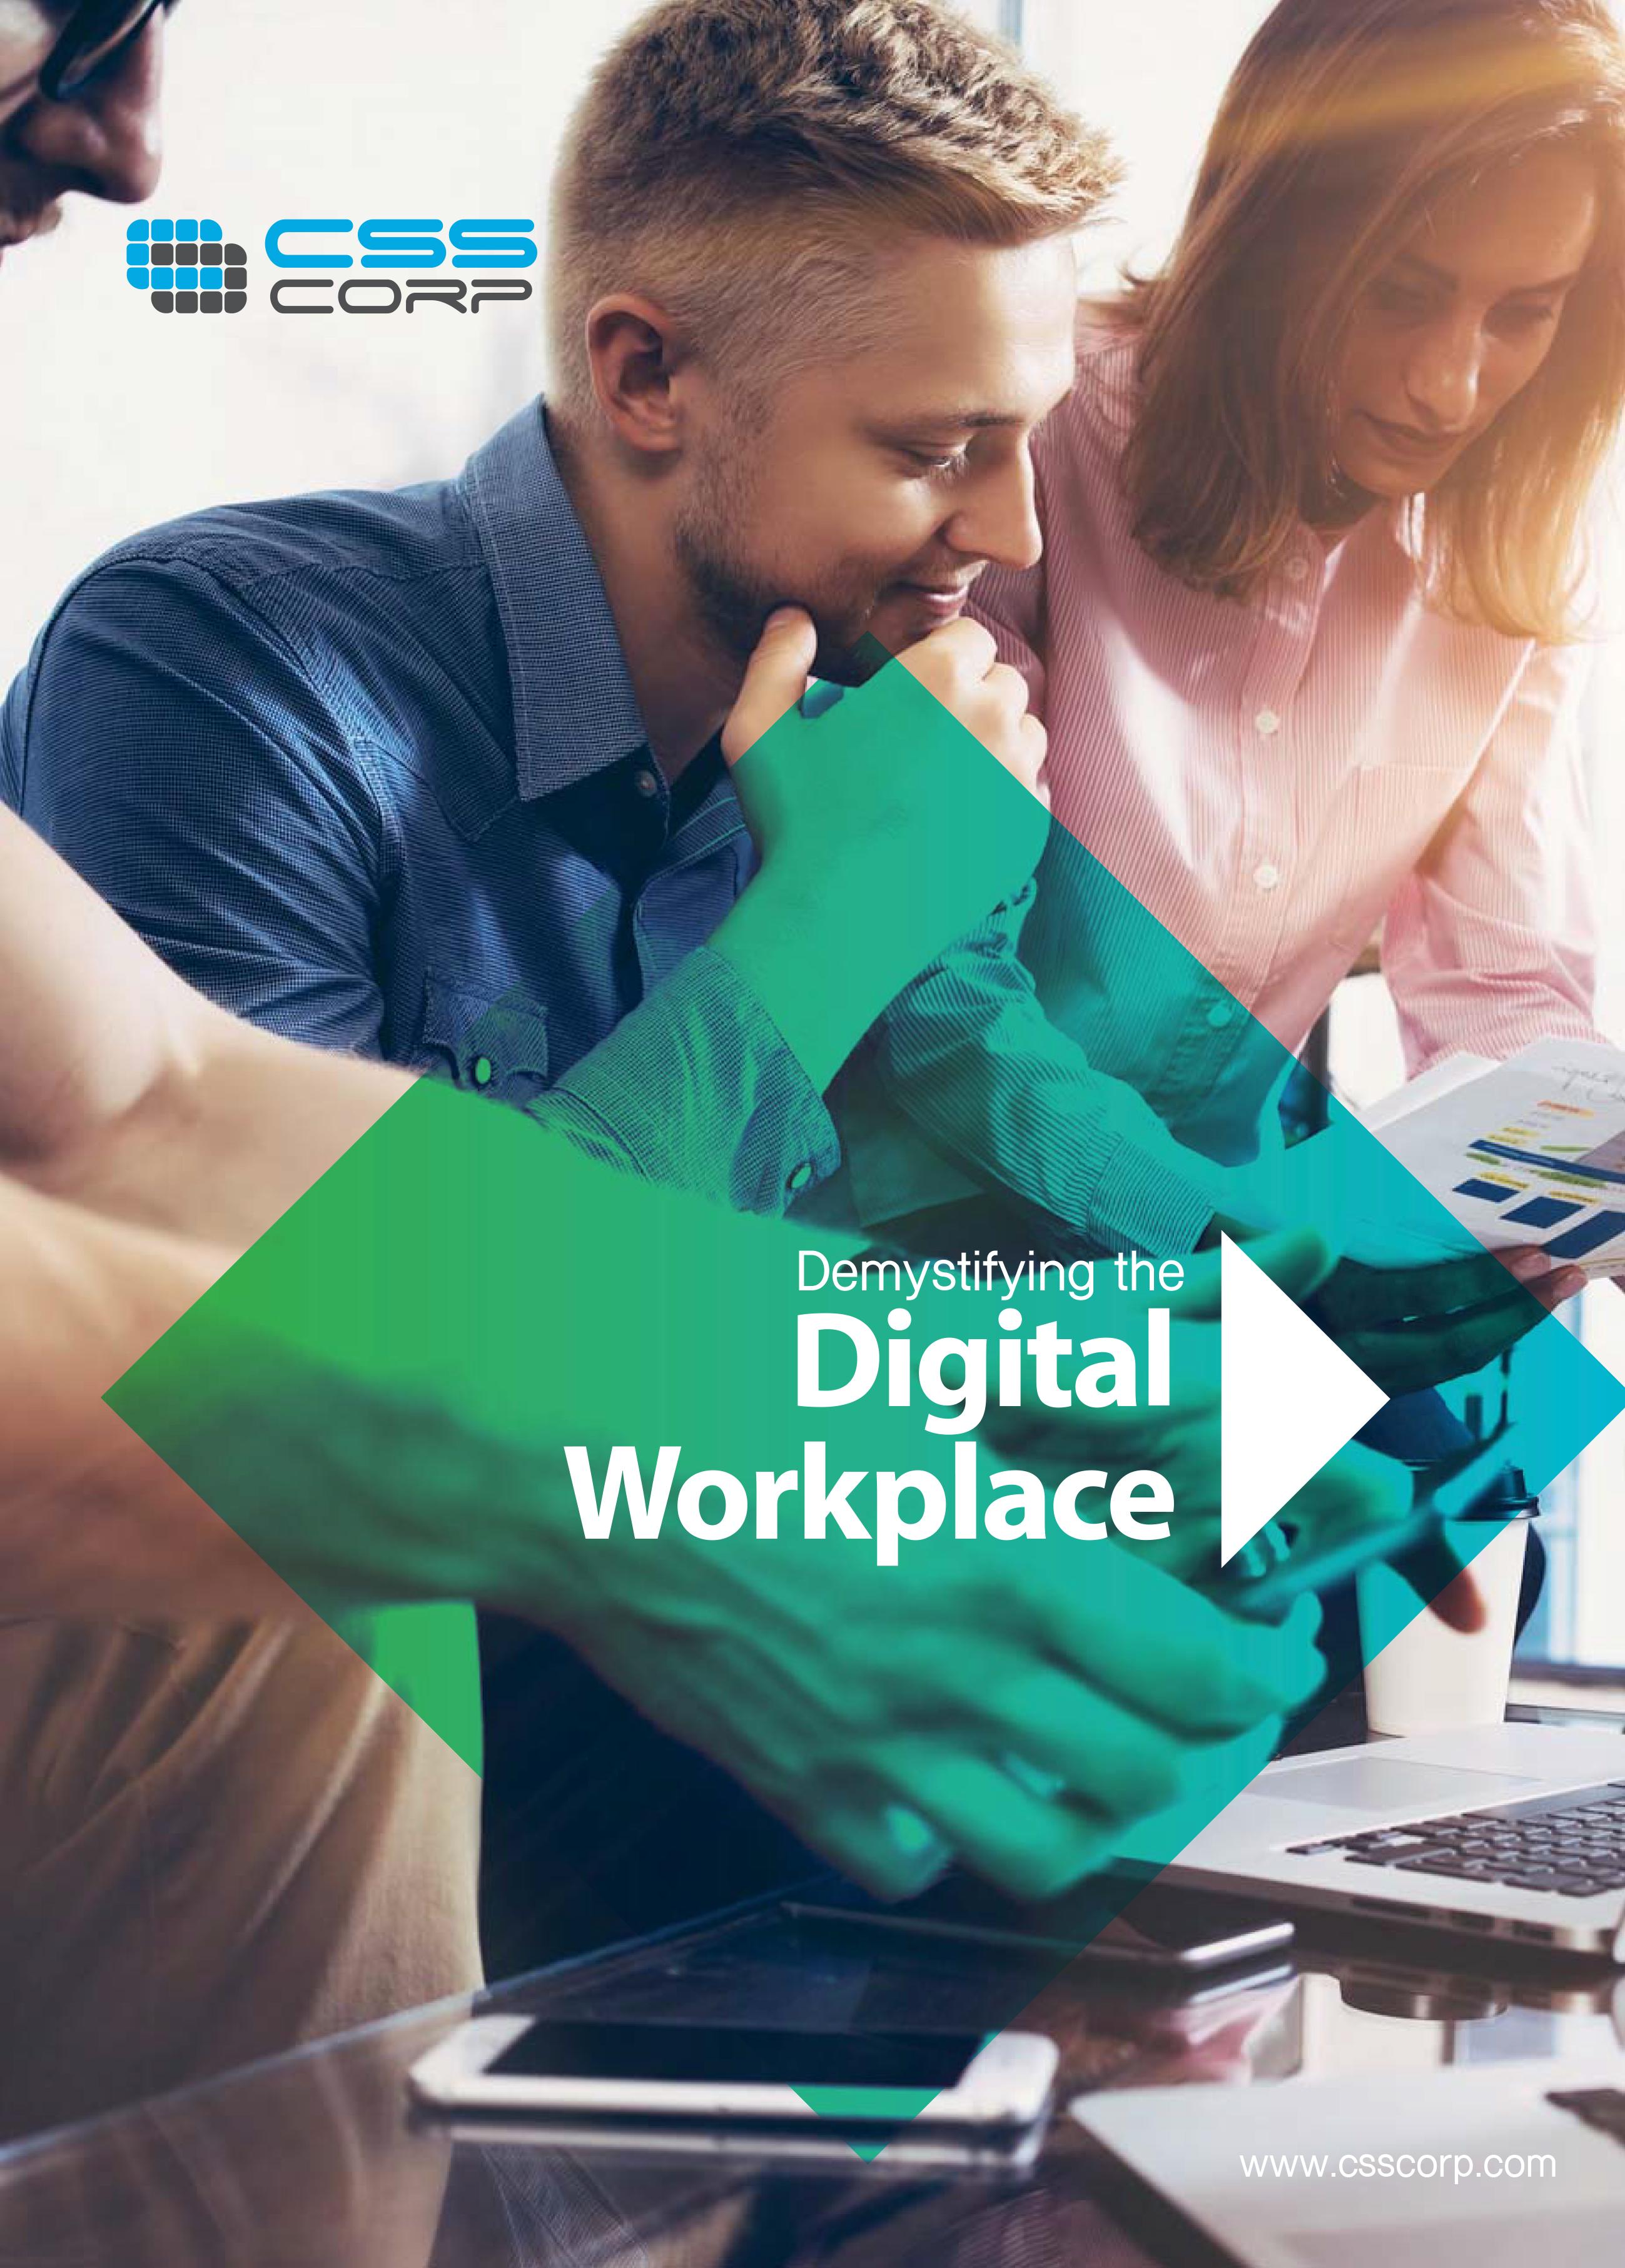 Demystifyiing the digital workspace